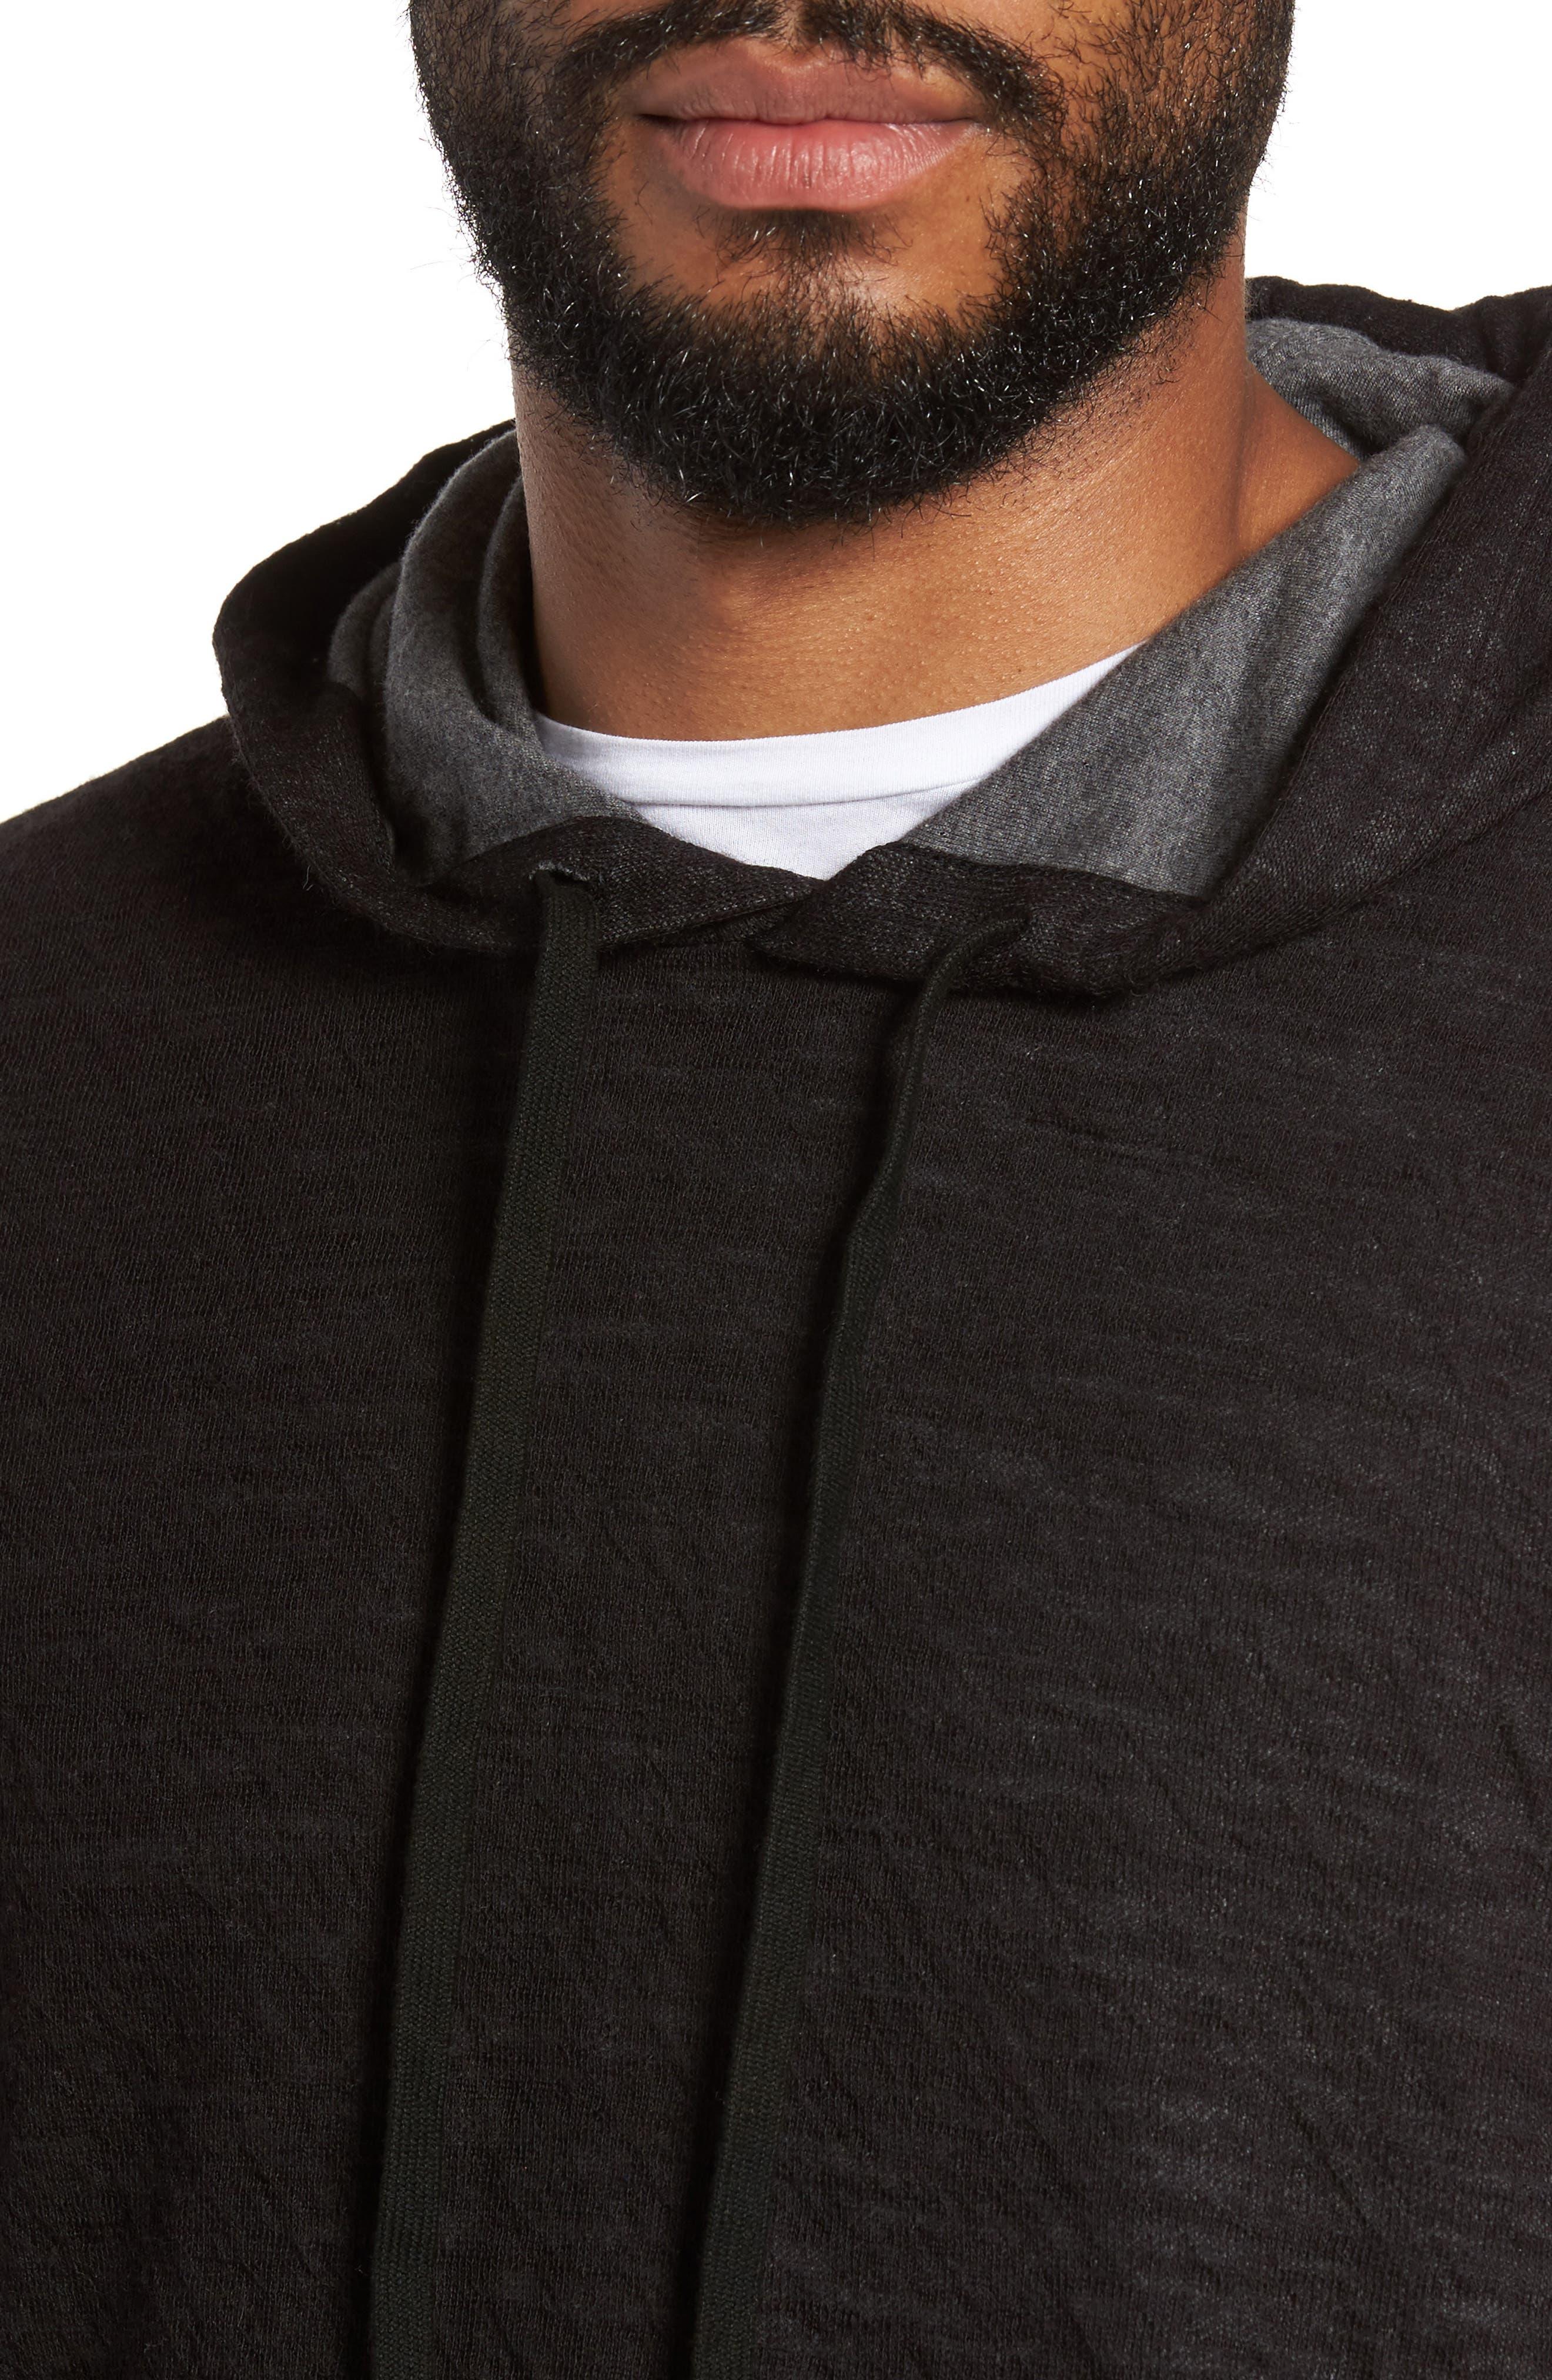 Contrast Double Knit Cotton & Wool Hoodie,                             Alternate thumbnail 4, color,                             Black/ H Carbon